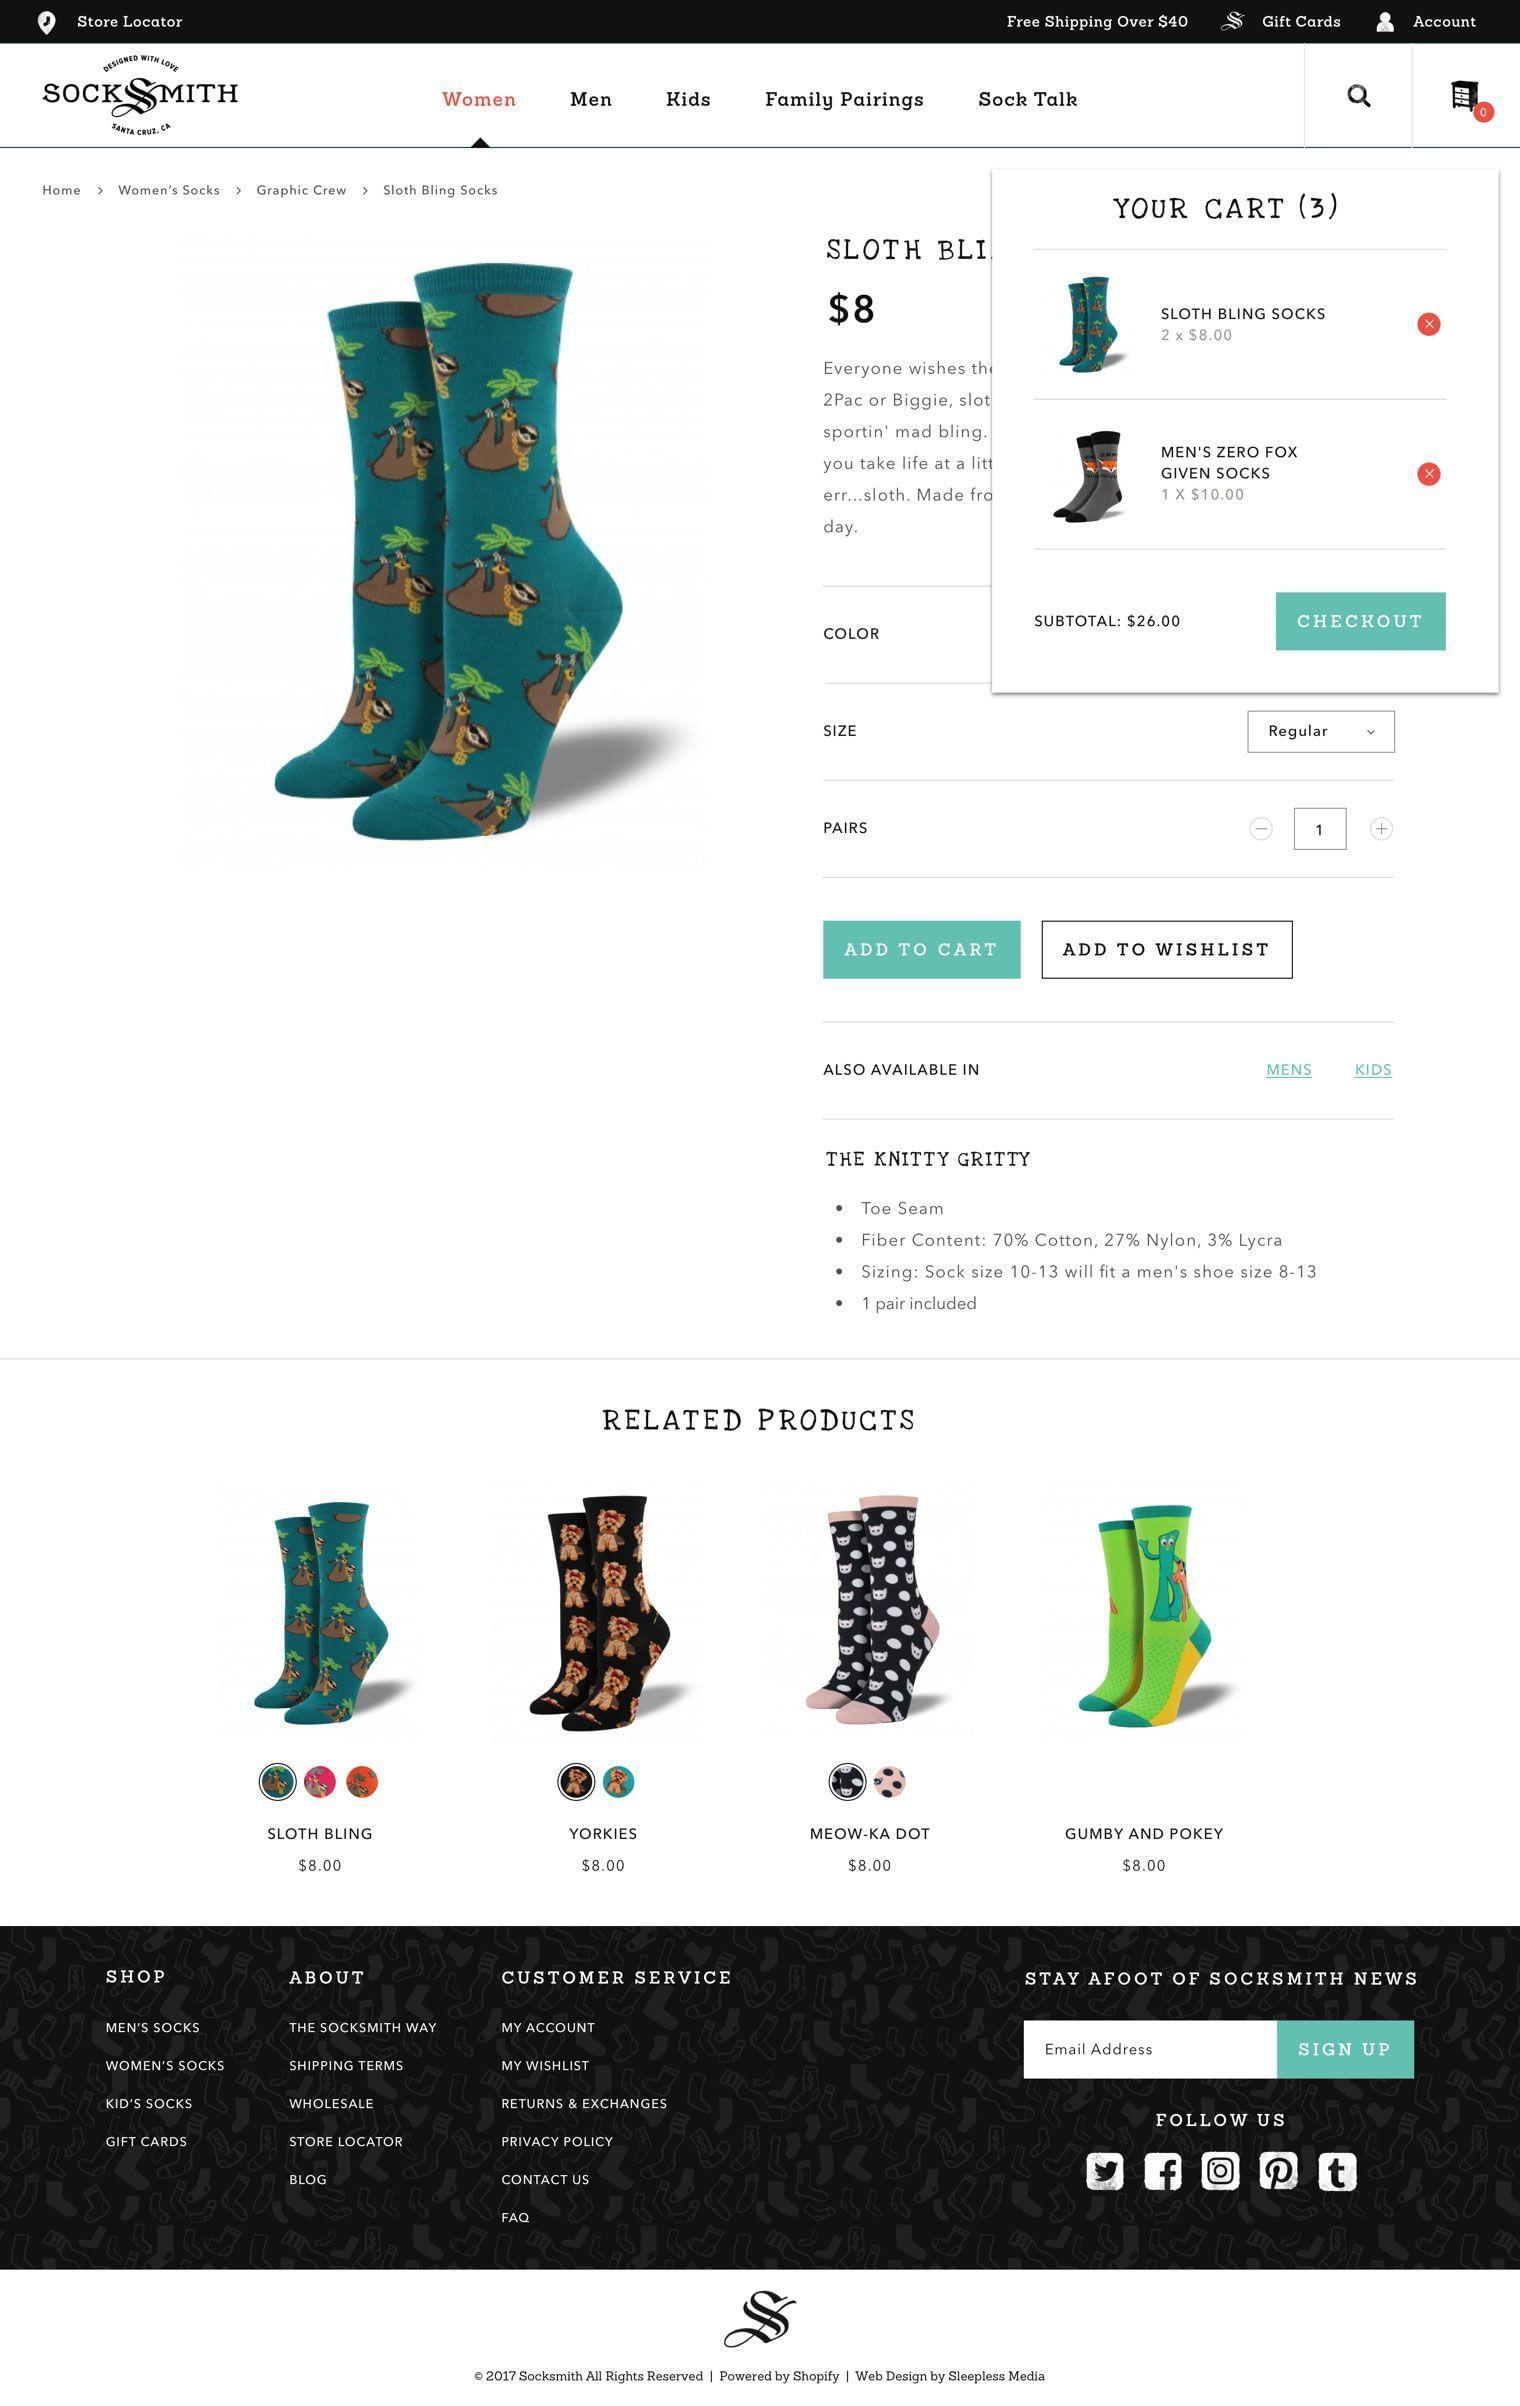 Socksmith - Checkout